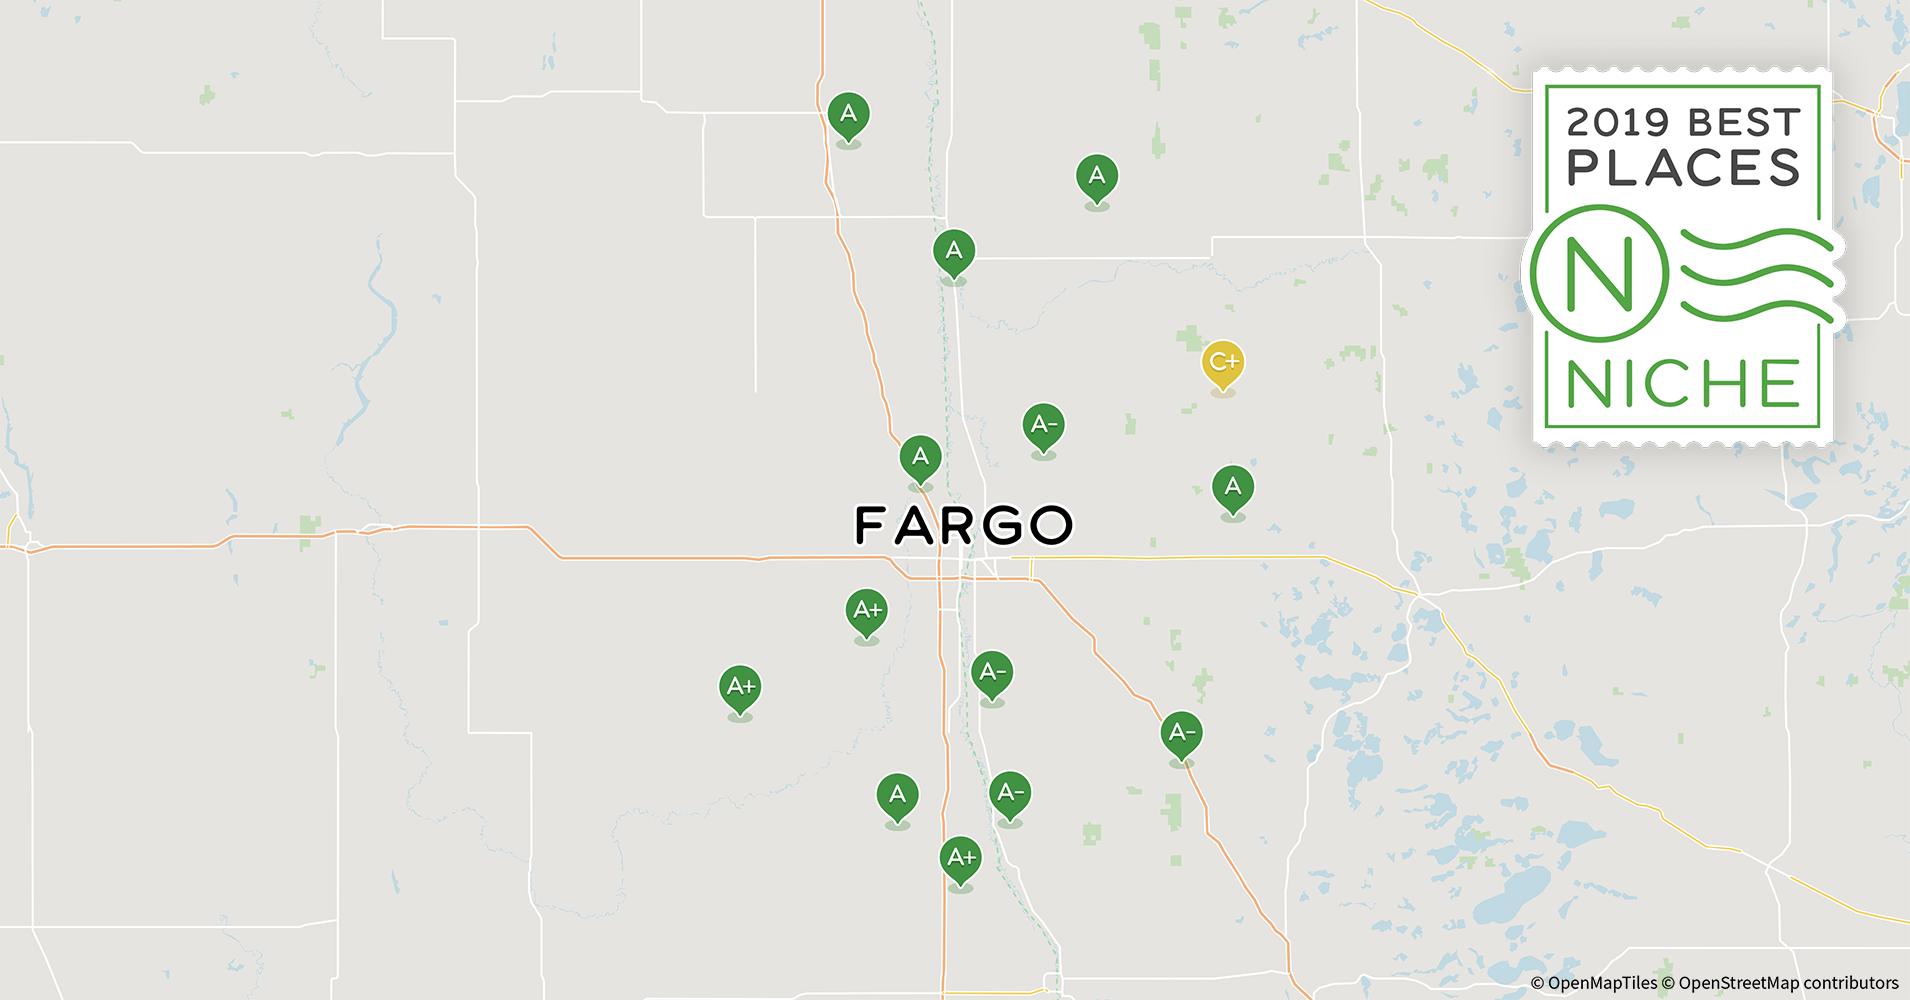 2019 Best Neighborhoods to Live in Fargo Area - Niche City Of Fargo Nd Map on jamestown nd flood map, south fargo map, fargo nd flood map, west fargo nd zoning map, clay county nd map, city of fargo flood, city of center nd, city of west fargo nd, city of fargo gis, fargo nd on map, kirkwood mall bismarck nd map, city of bismarck nd map, city of grand forks nd map, fargo north dakota map, fargo road map, fargo street map, fargo district map, fargo nd zip code map, city of fargo north dakota, city of dickinson nd map,